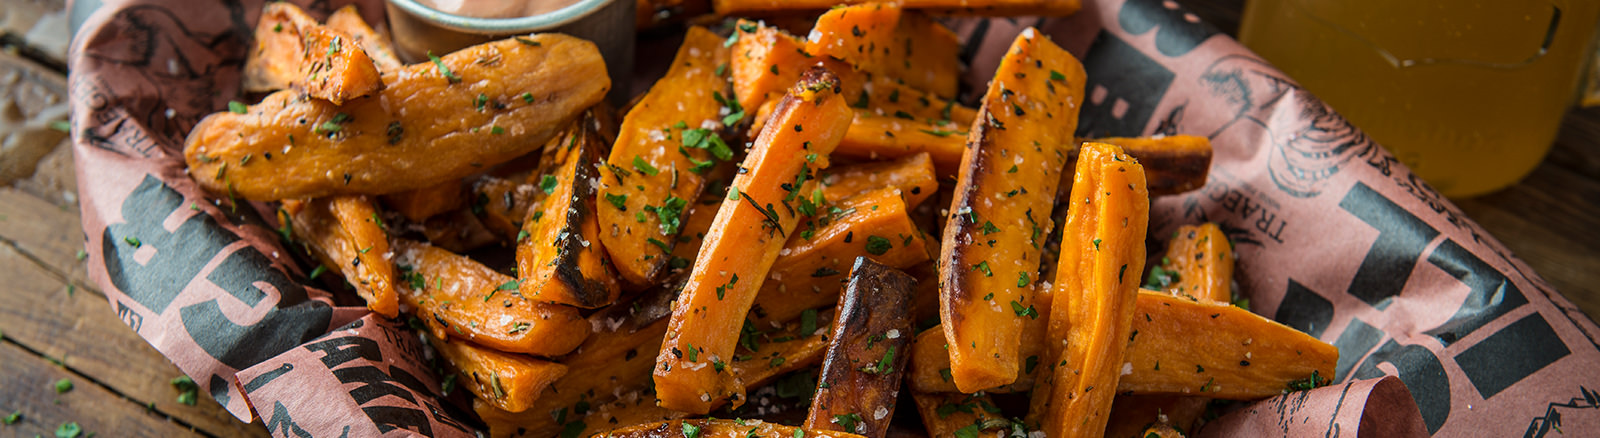 Sweet Potato Steak Fries Traeger Wood Fired Grills